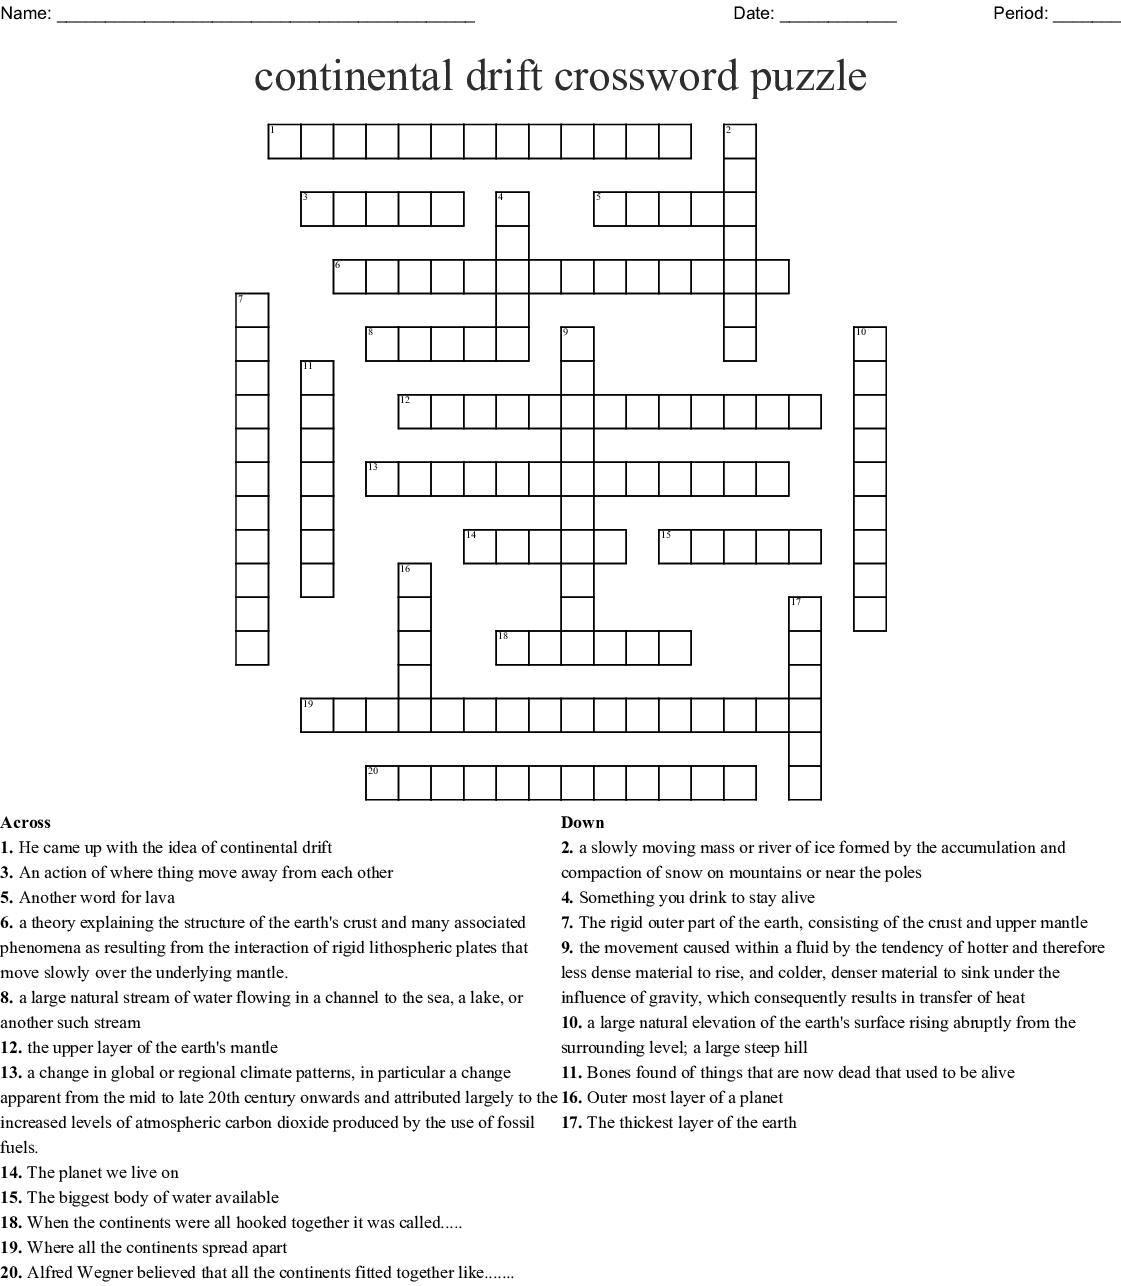 Continental Drift Crossword Puzzle